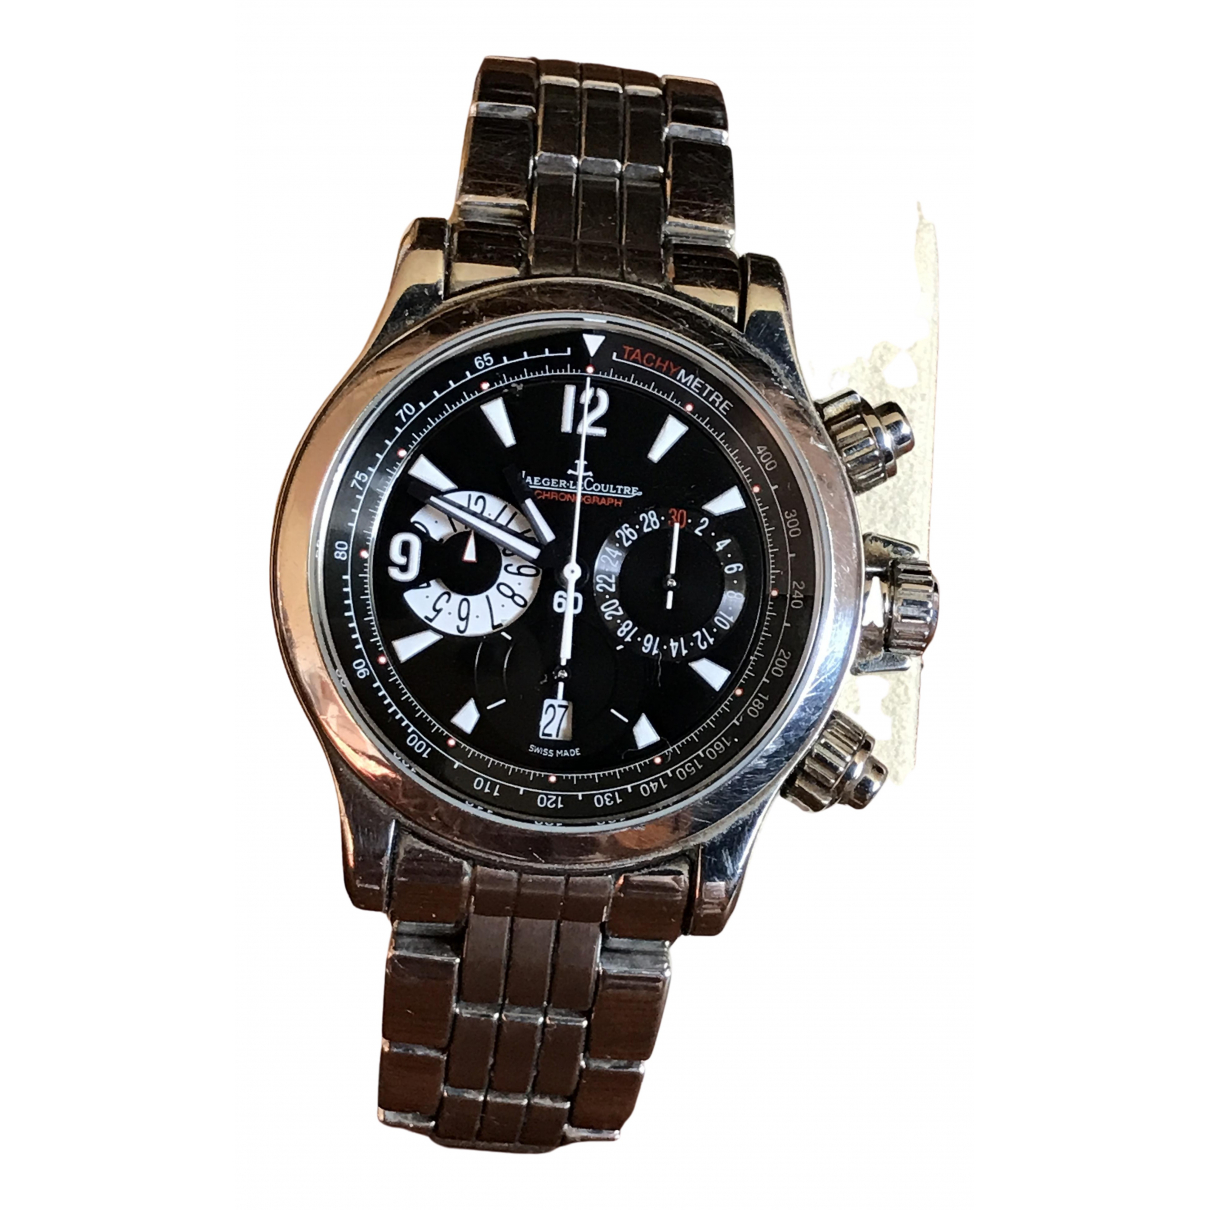 Jaeger-lecoultre Master Compressor  Uhr in  Metallic Stahl